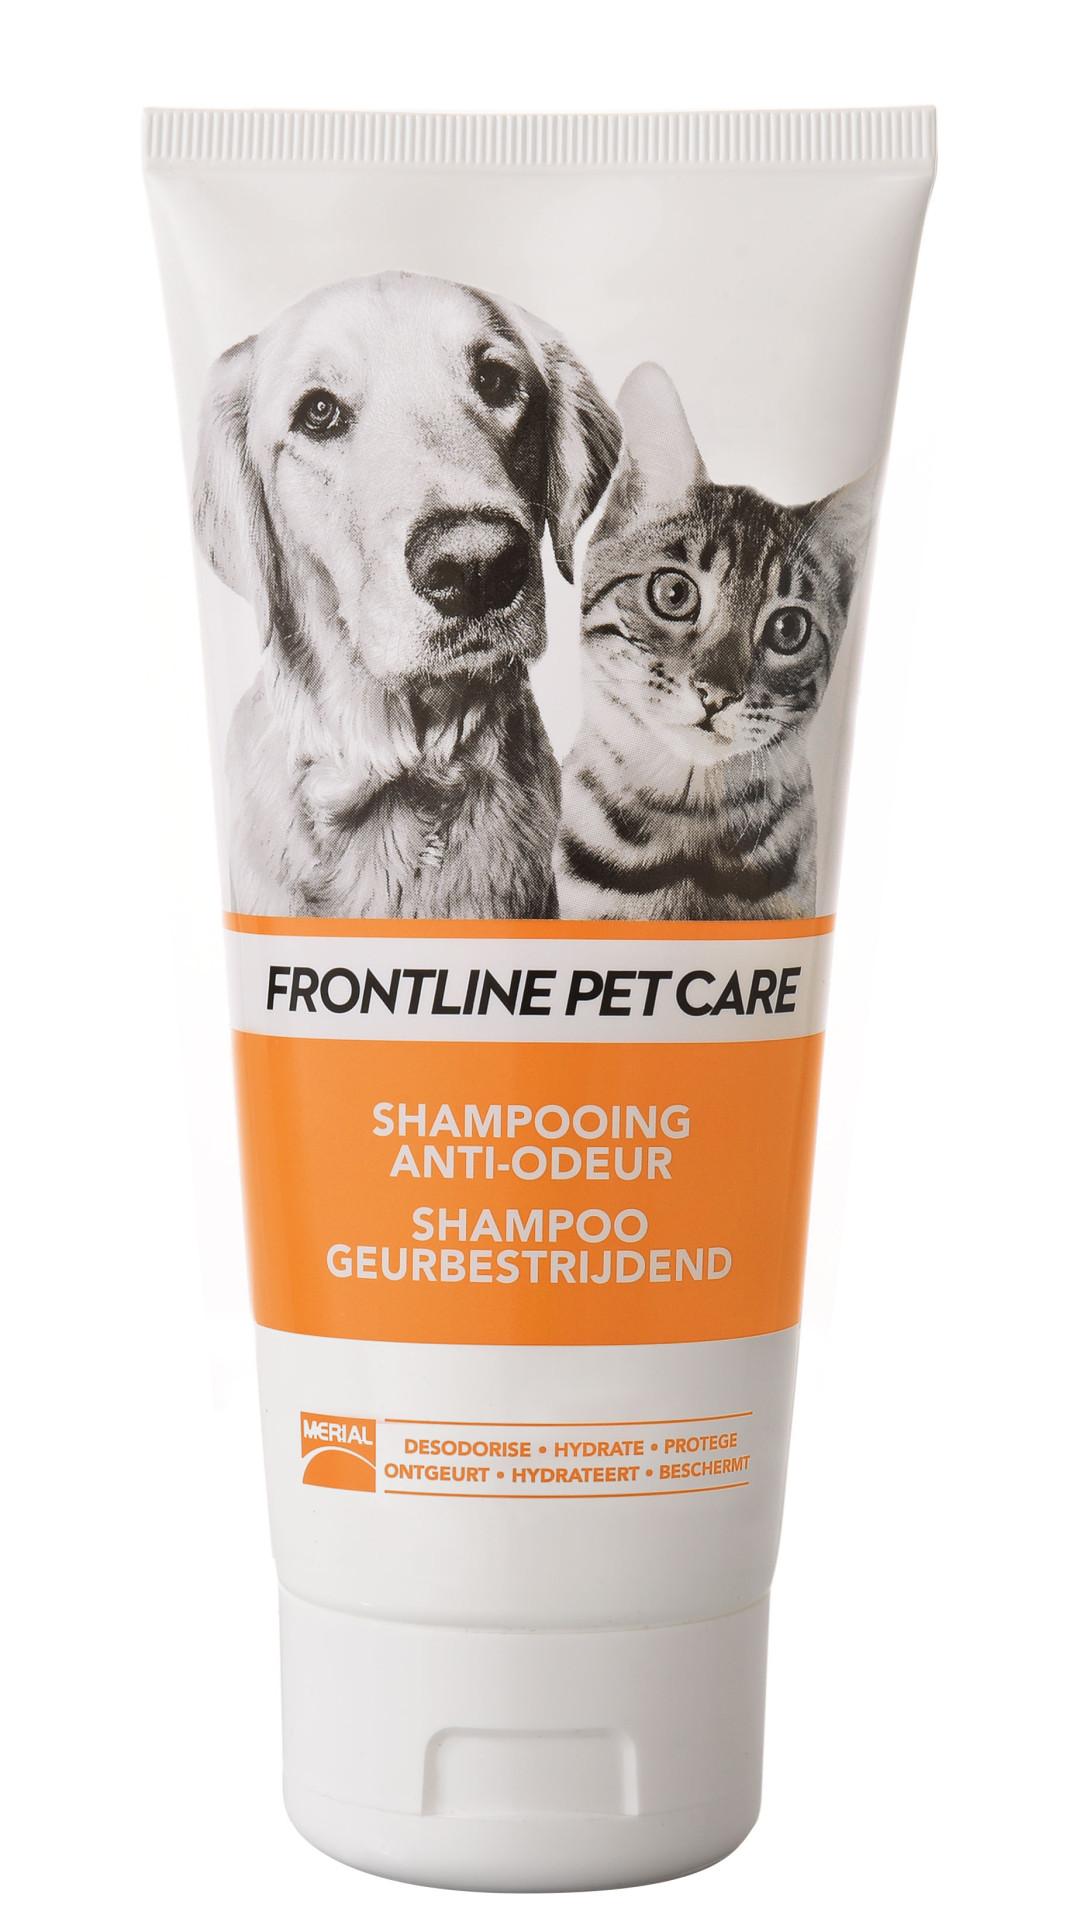 Frontline Pet Care shampoo Geurbestrijdend 200 ml